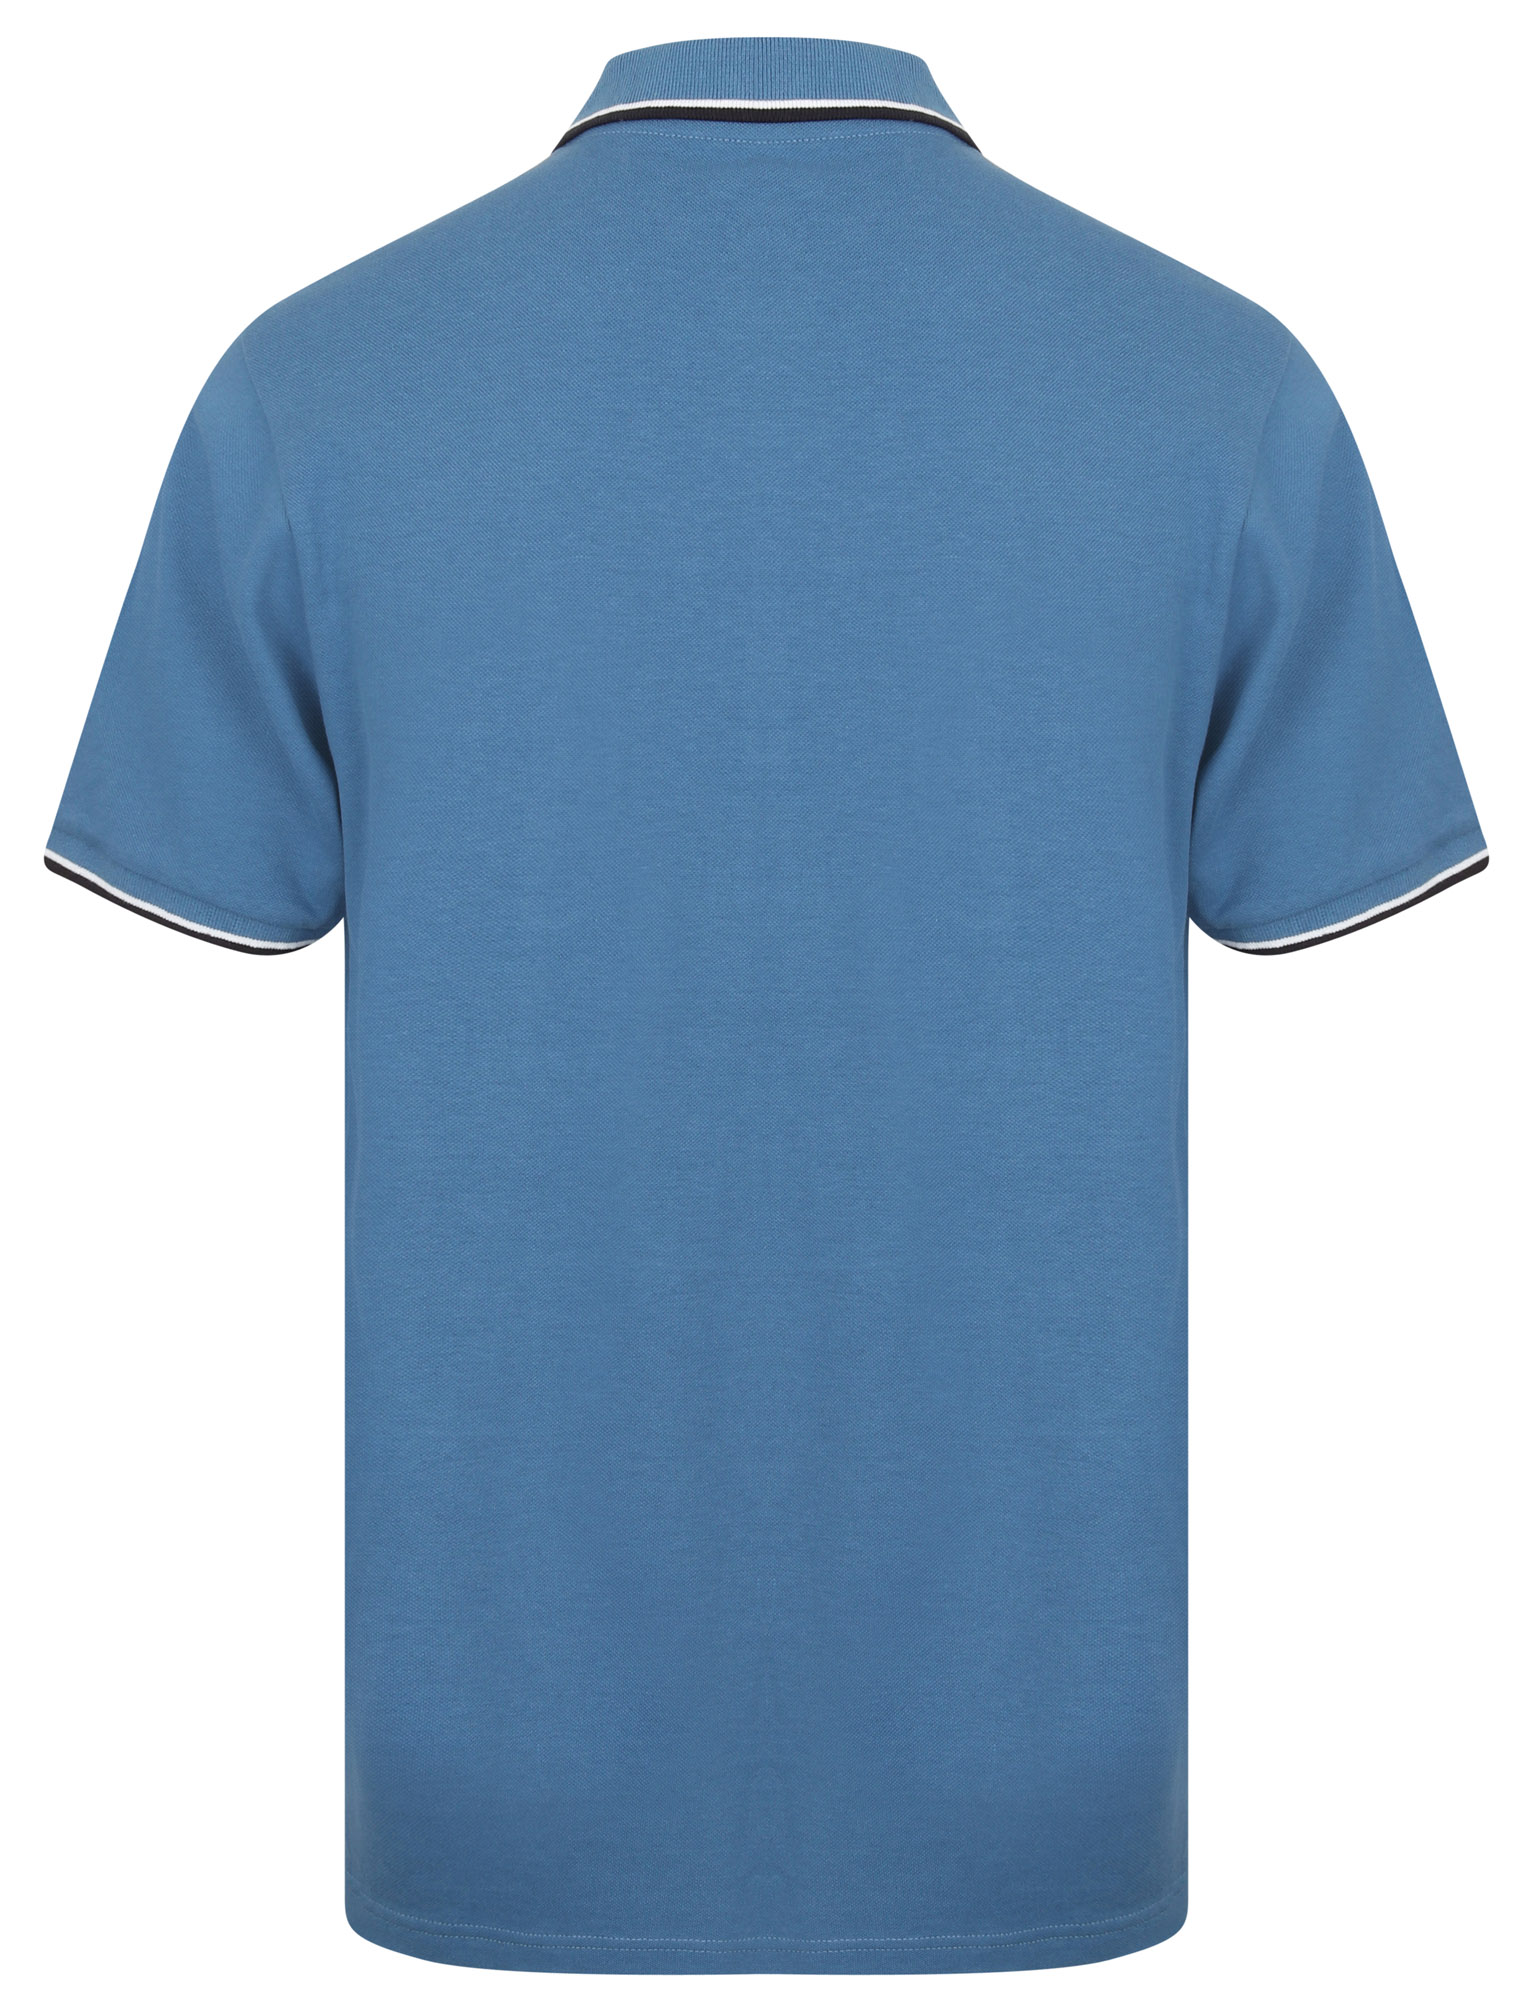 Sth-Shore-Mens-Plain-Polo-Shirt-100-Pique-Cotton-T-Shirt-Top-Collar-Size-M-XXL thumbnail 11